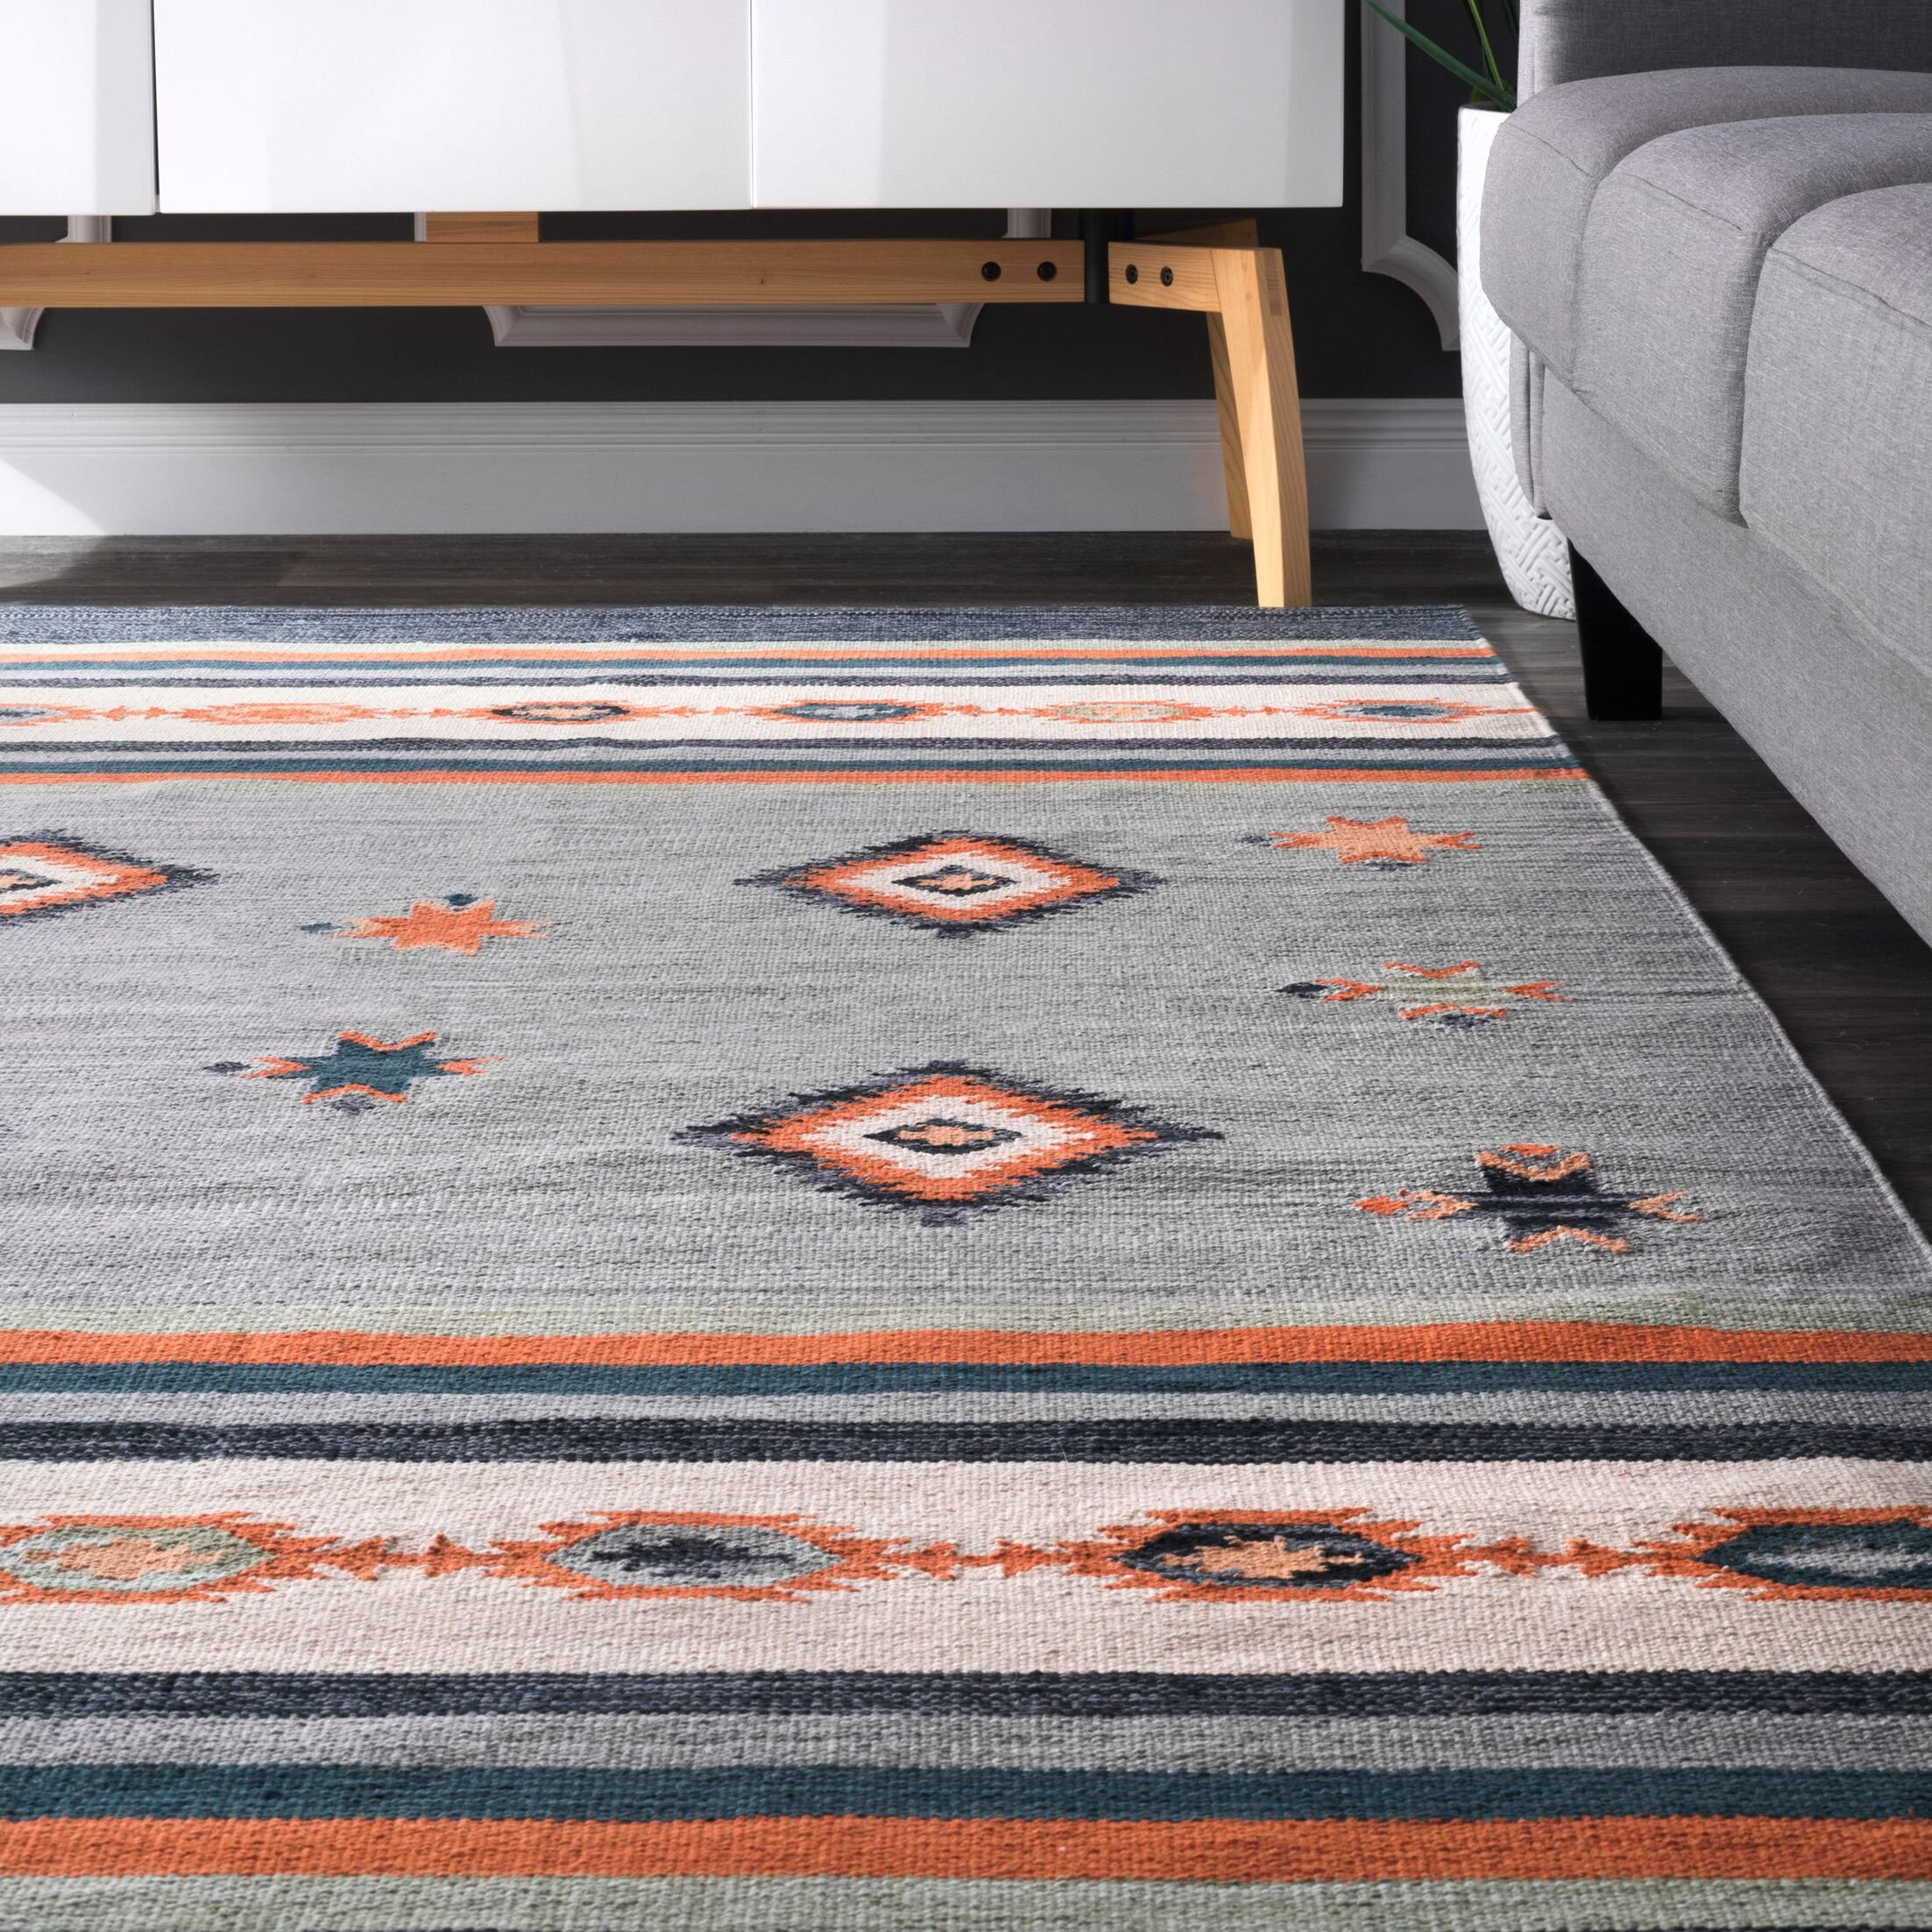 Hailer Hand Loomed Cotton Gray/Orange Area Rug Rug Size: Rectangle 6' x 9'